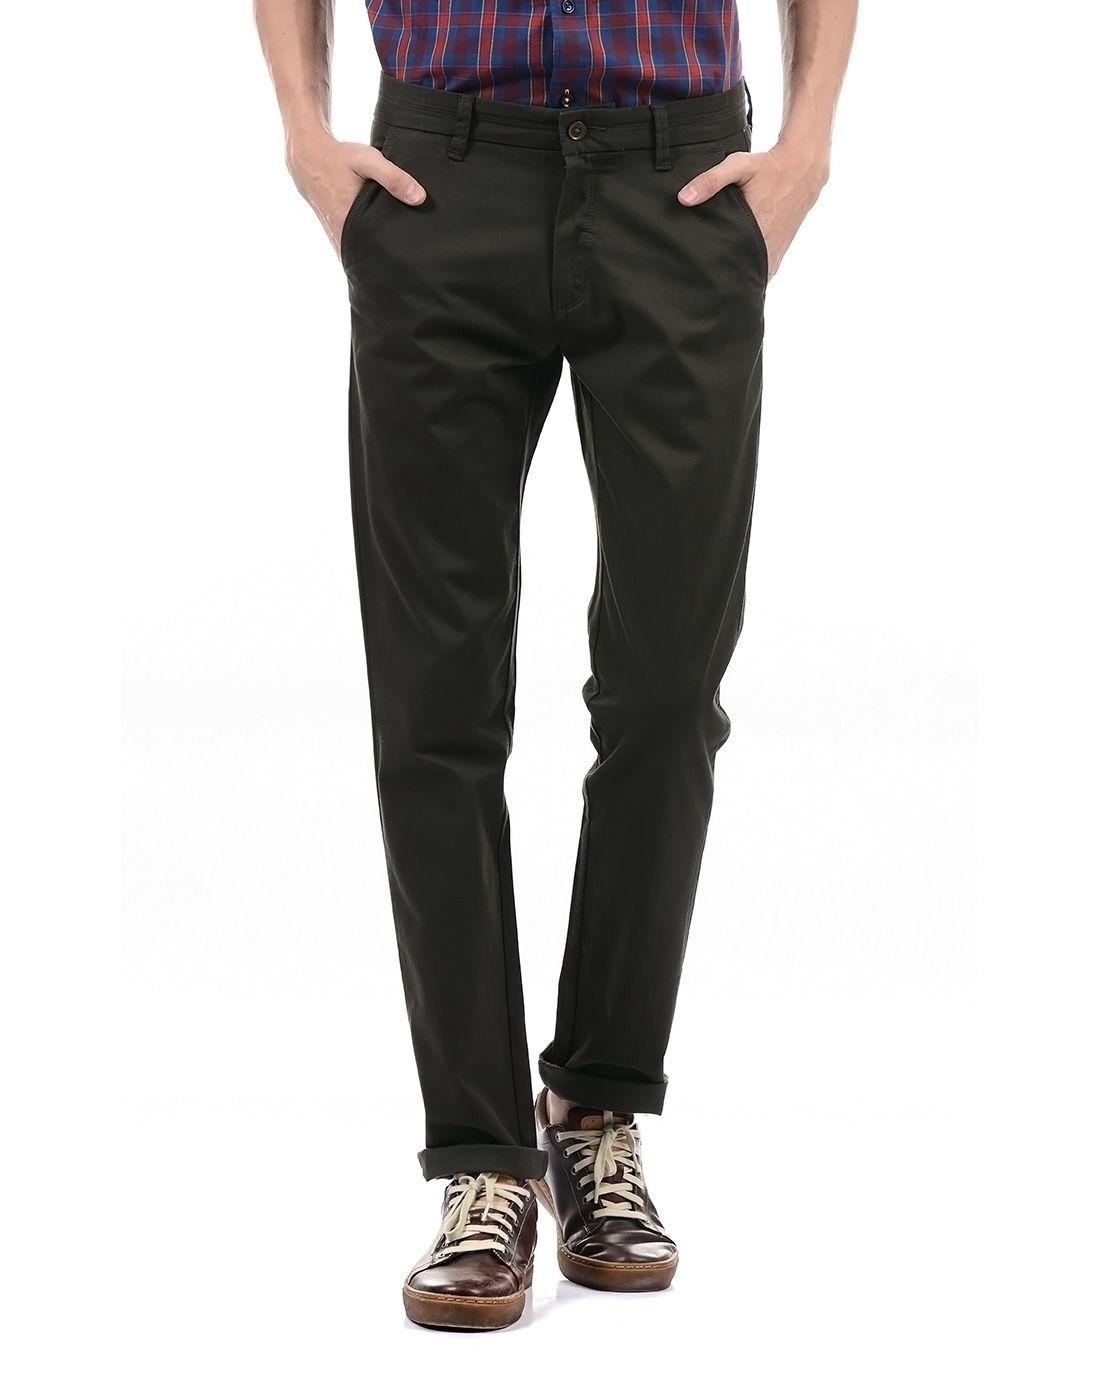 Arrow Sport Green Slim -Fit Flat Trousers